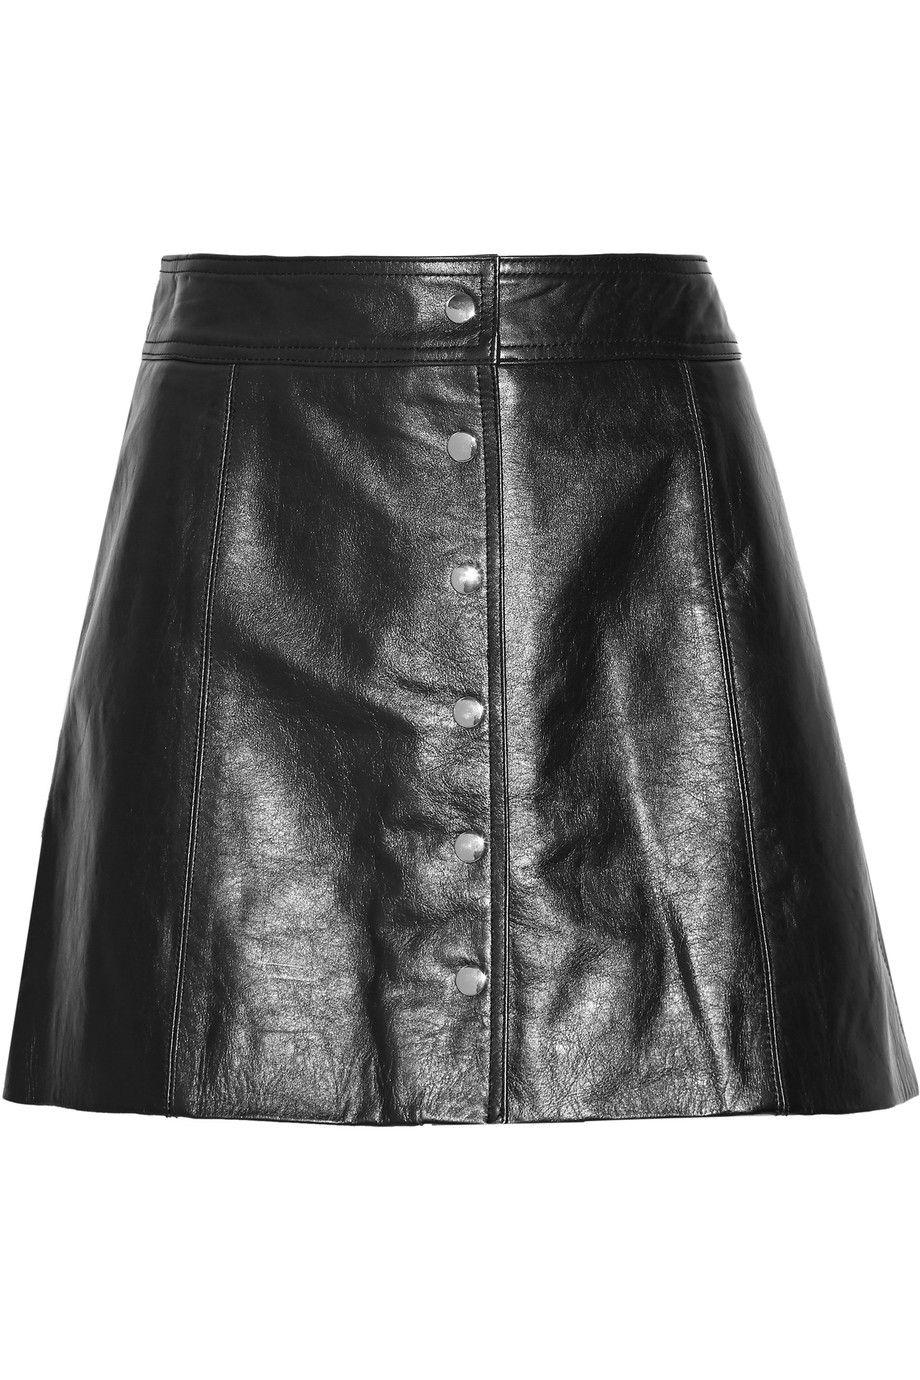 5927afce17a4 ETOILE ISABEL MARANT Kais Leather Mini Skirt. #etoileisabelmarant #cloth # skirt